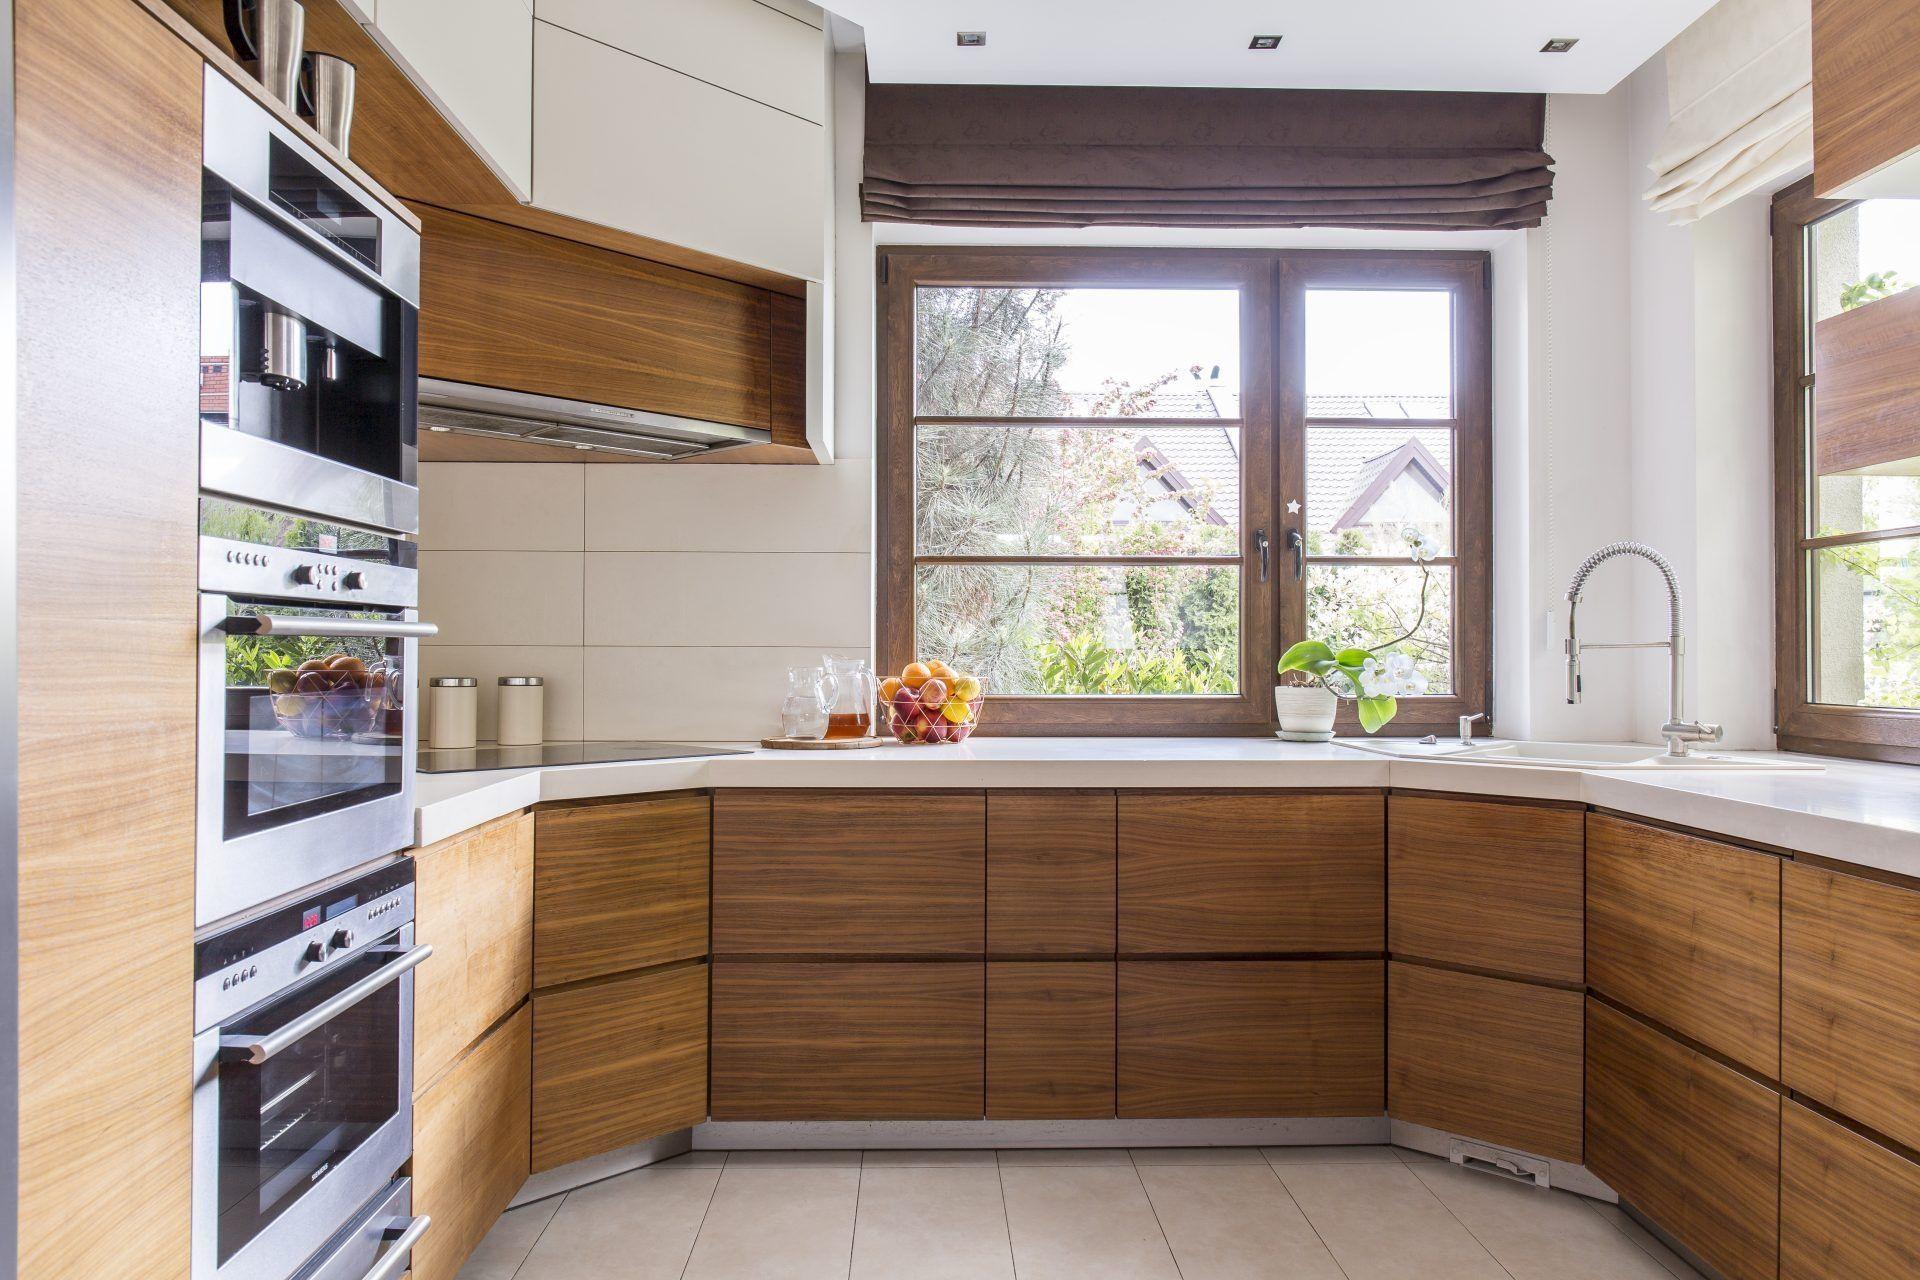 Kitchen Ideas Edinburgh In 2021 French Country Kitchens Interior Design Kitchen Front Room Furnishings